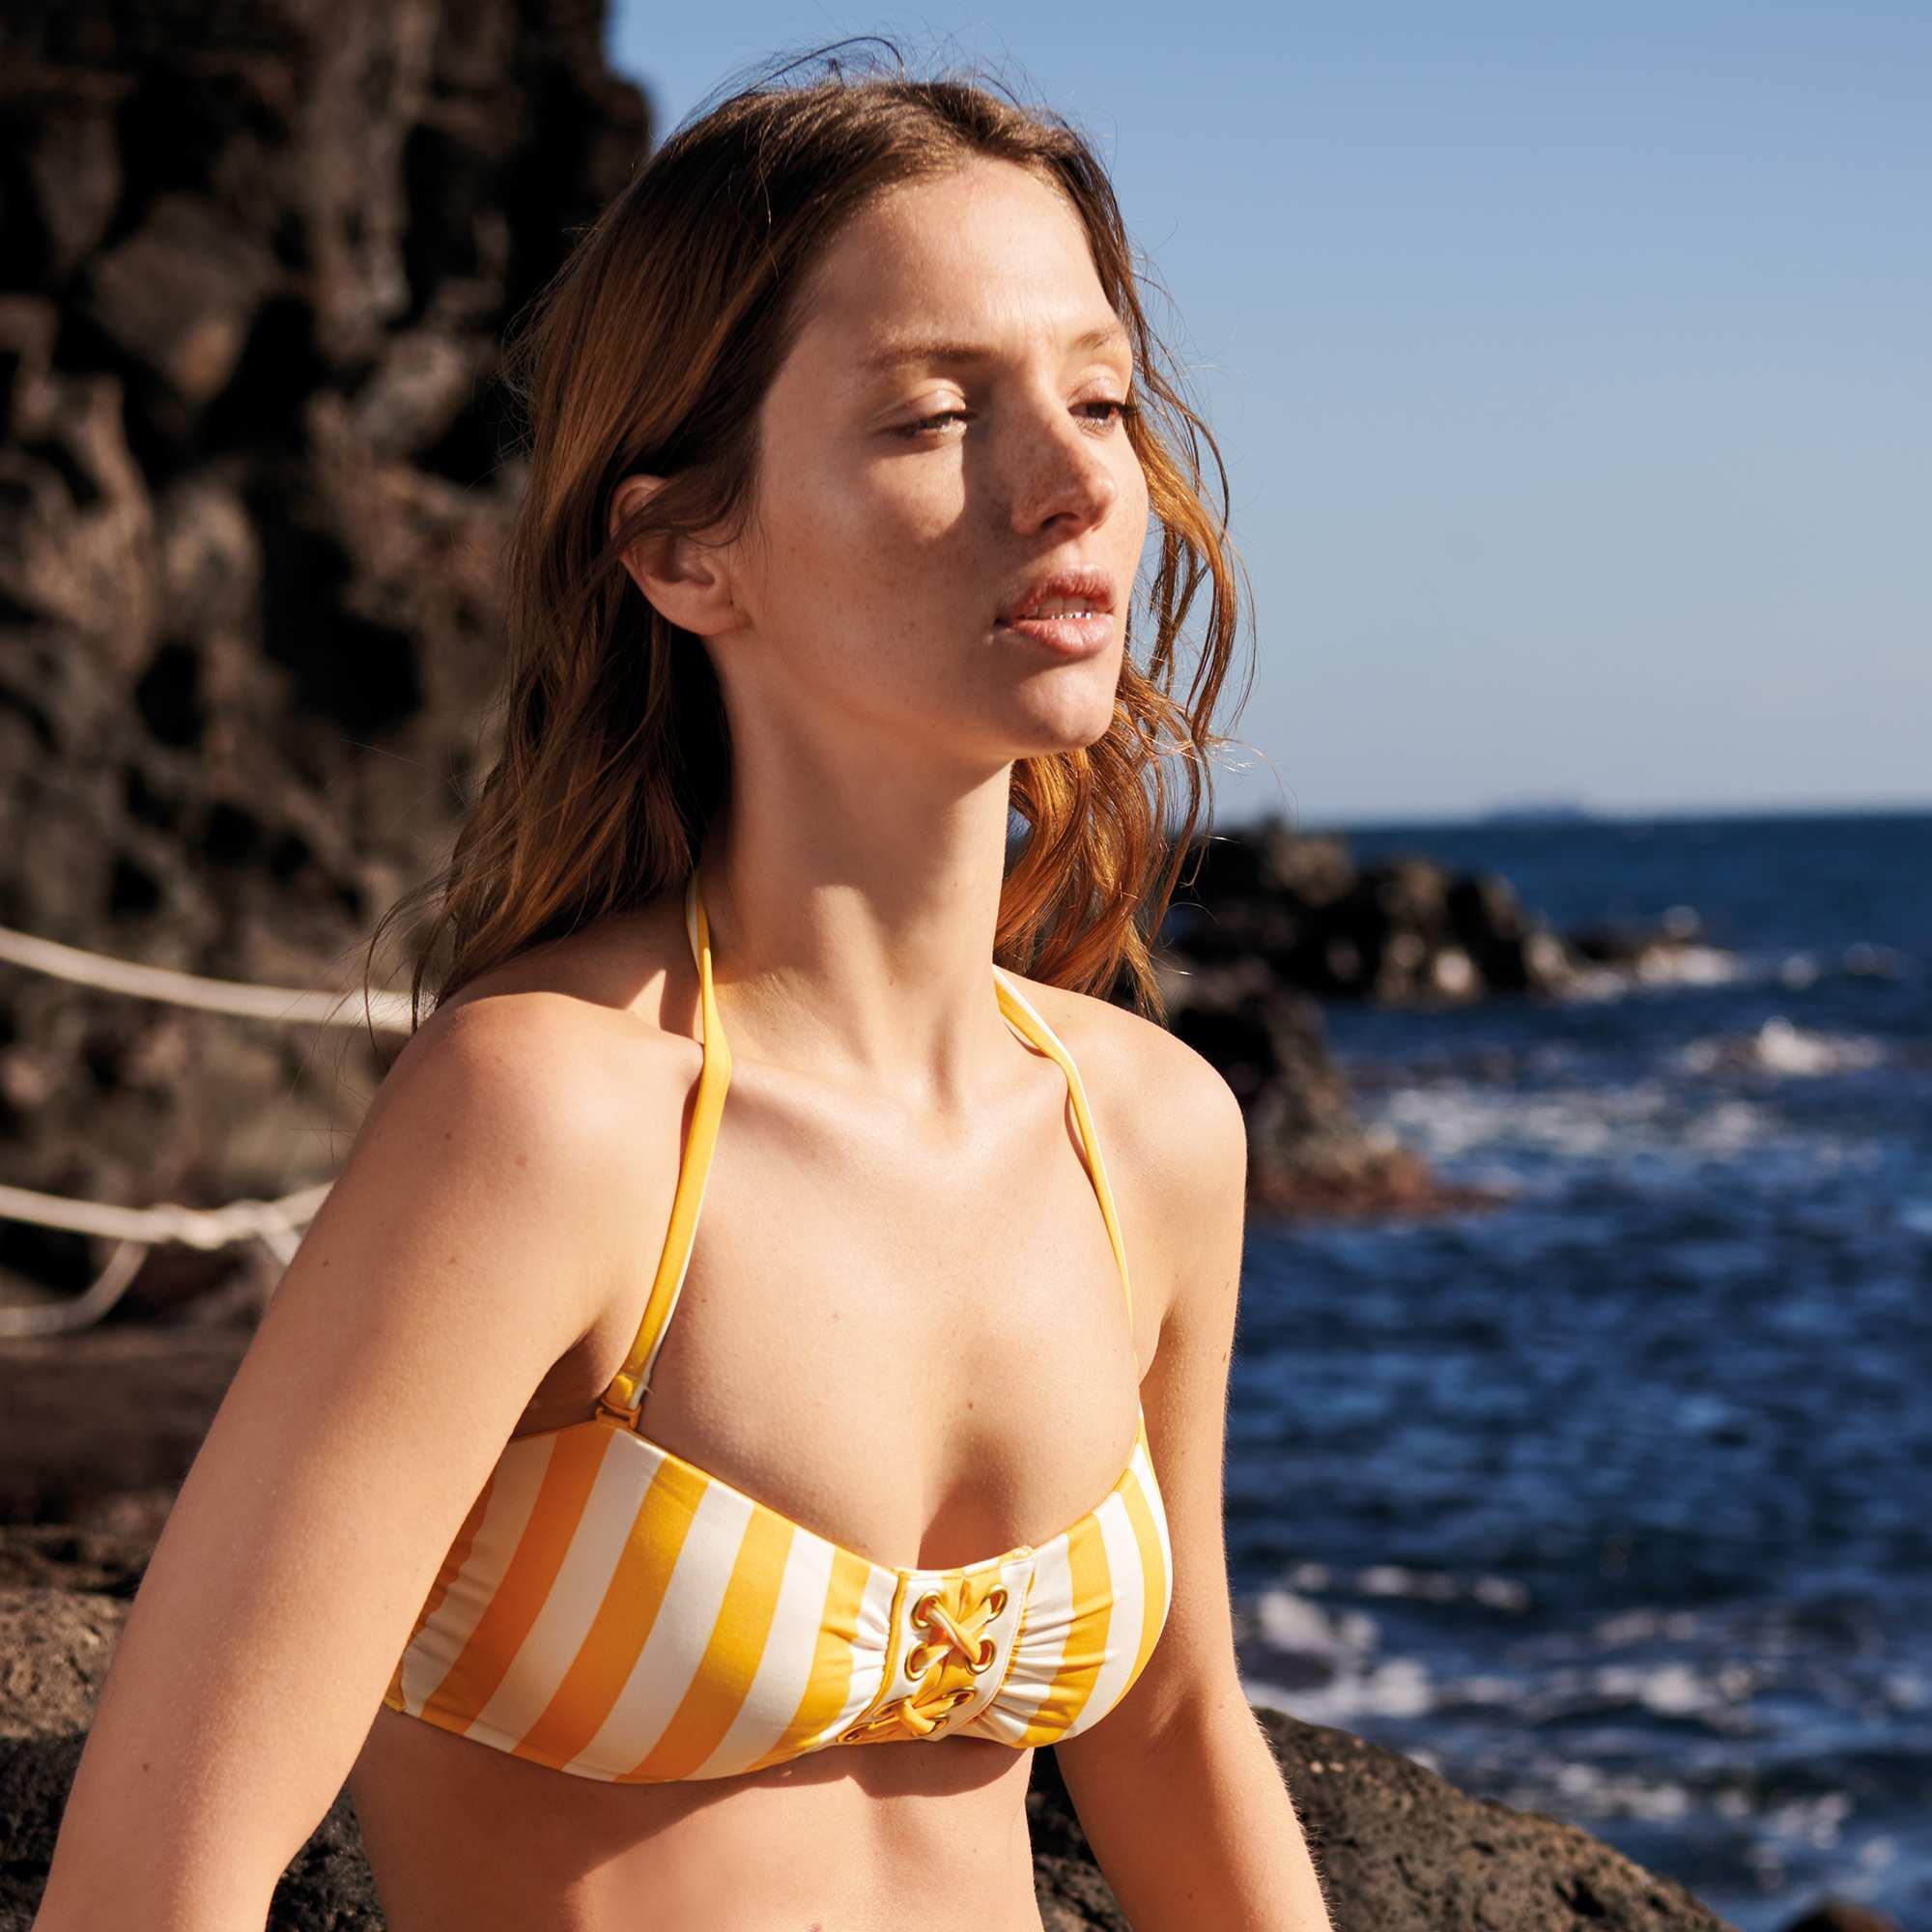 8081f91d01 Haut de maillot de bain laçage fantaisie Femme - jaune - Kiabi - 10,80€